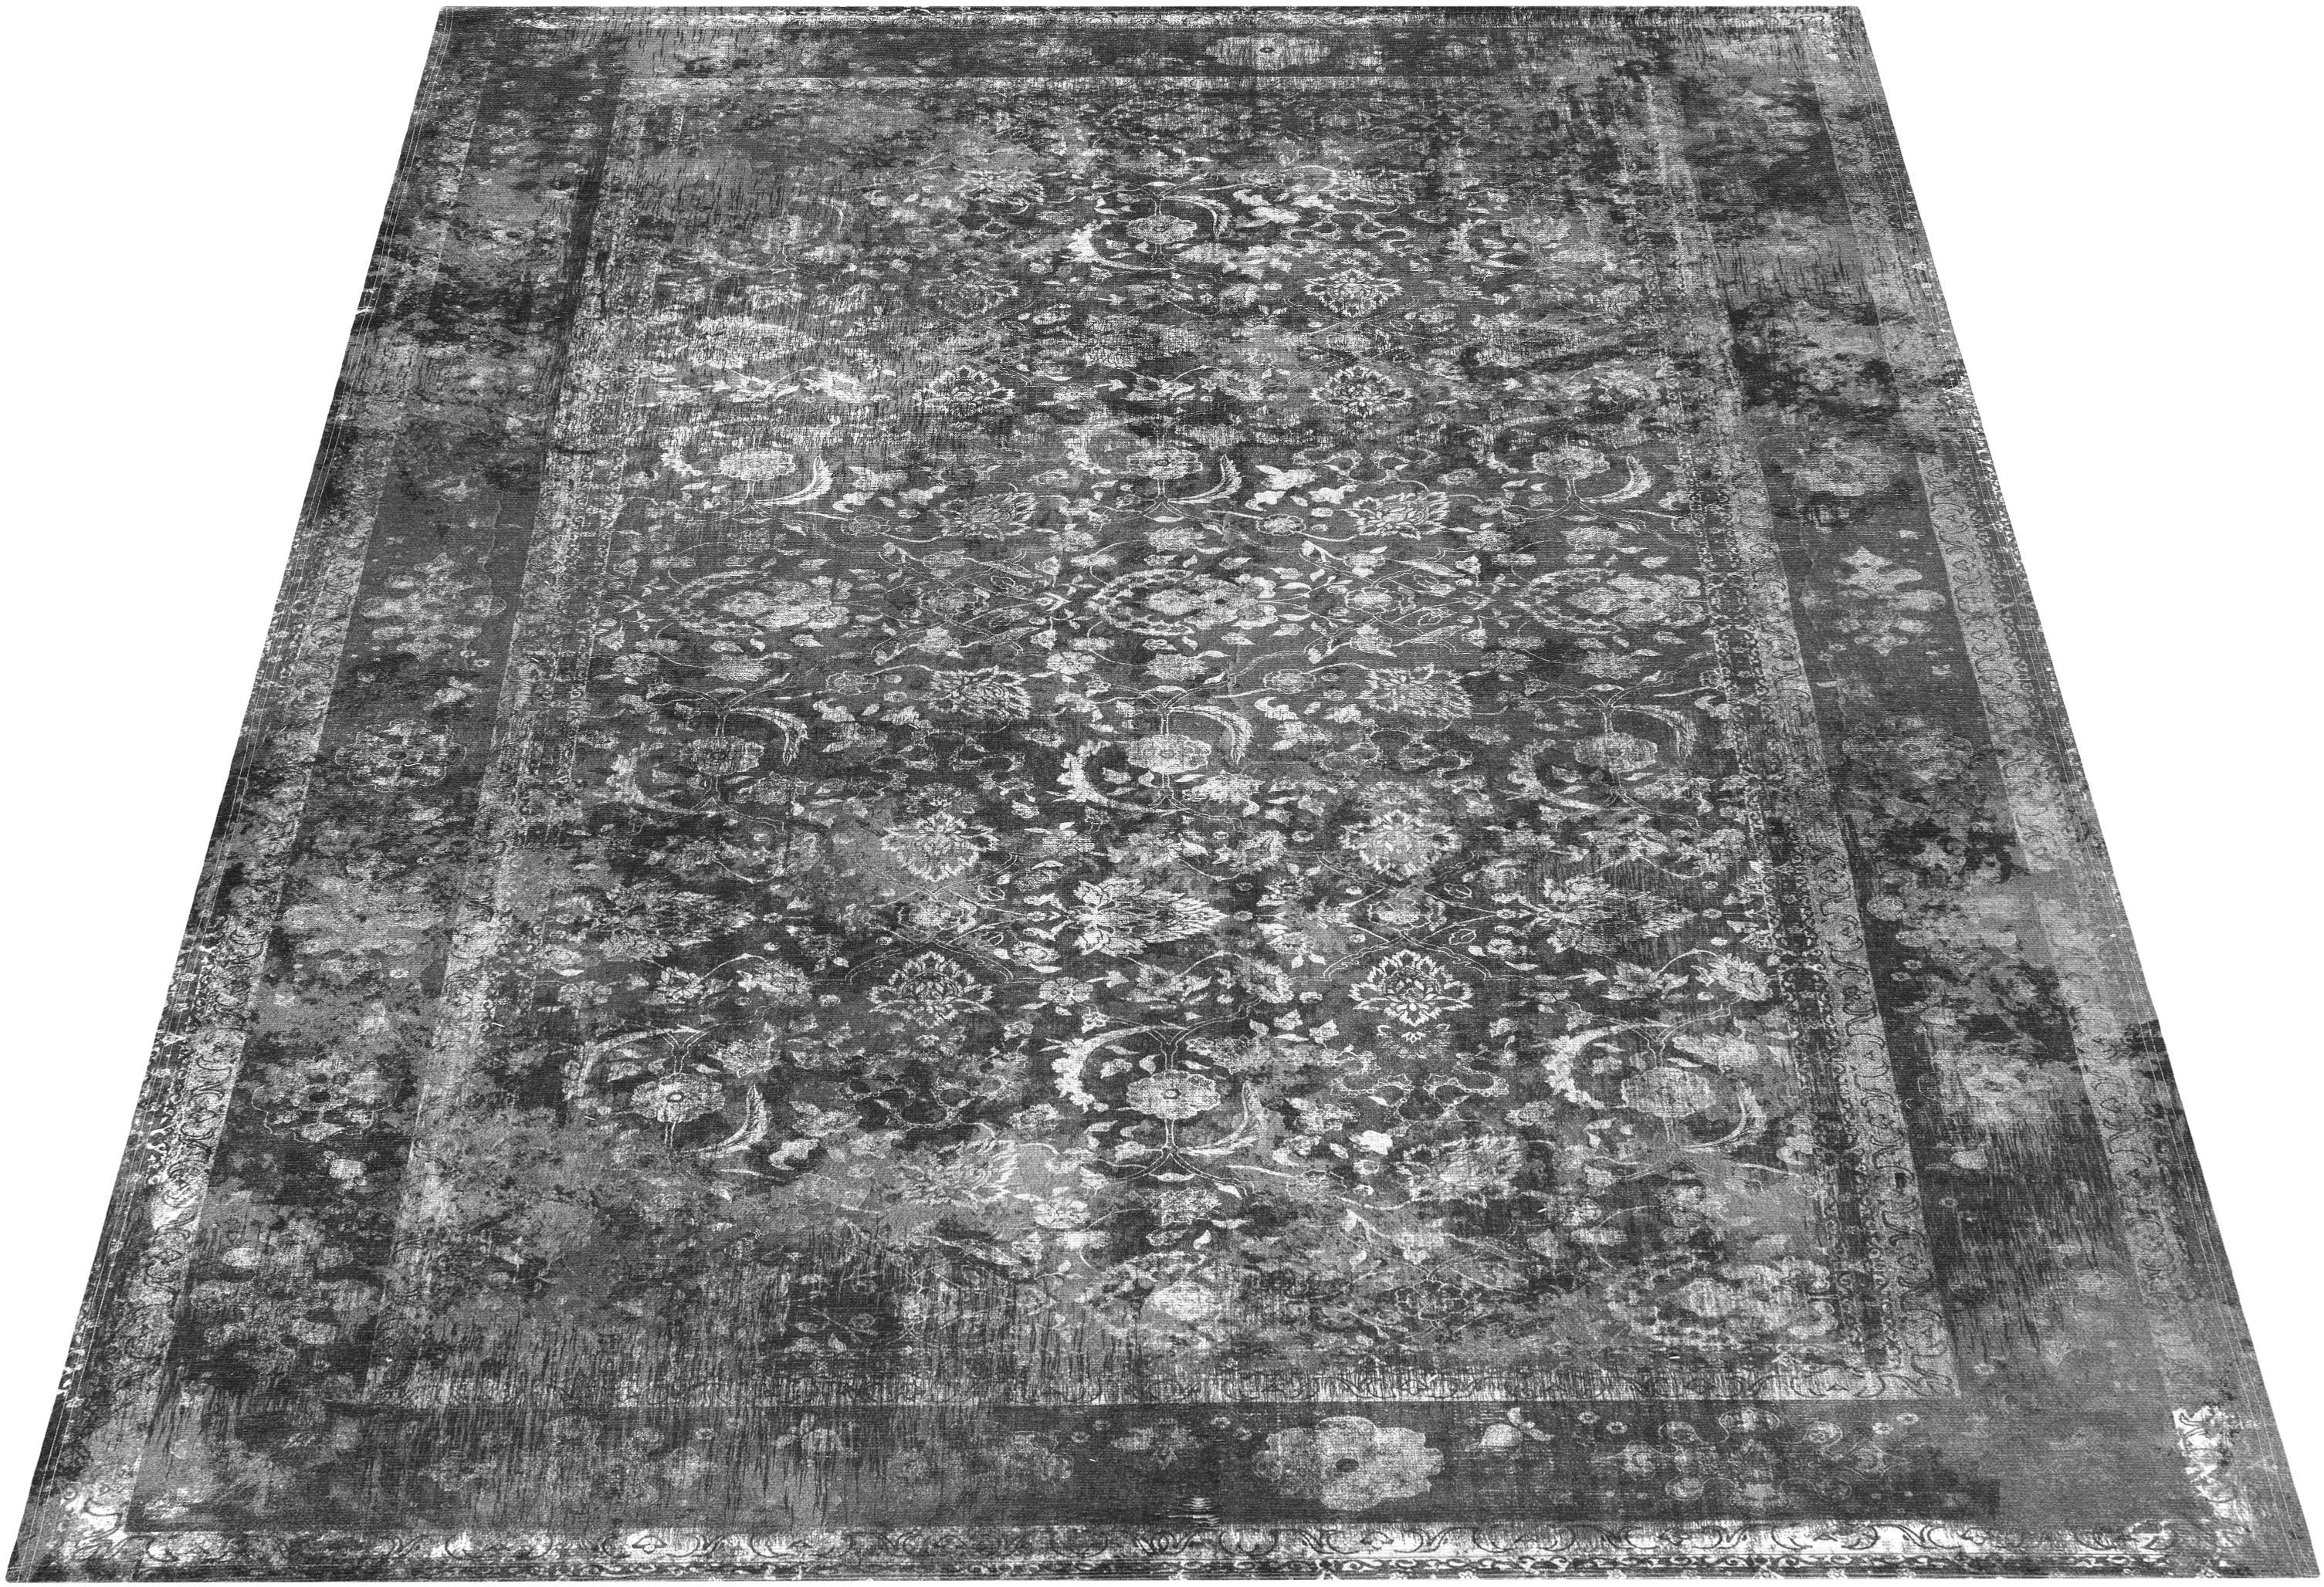 Teppich Everly Bruno Banani rechteckig Höhe 9 mm maschinell gewebt